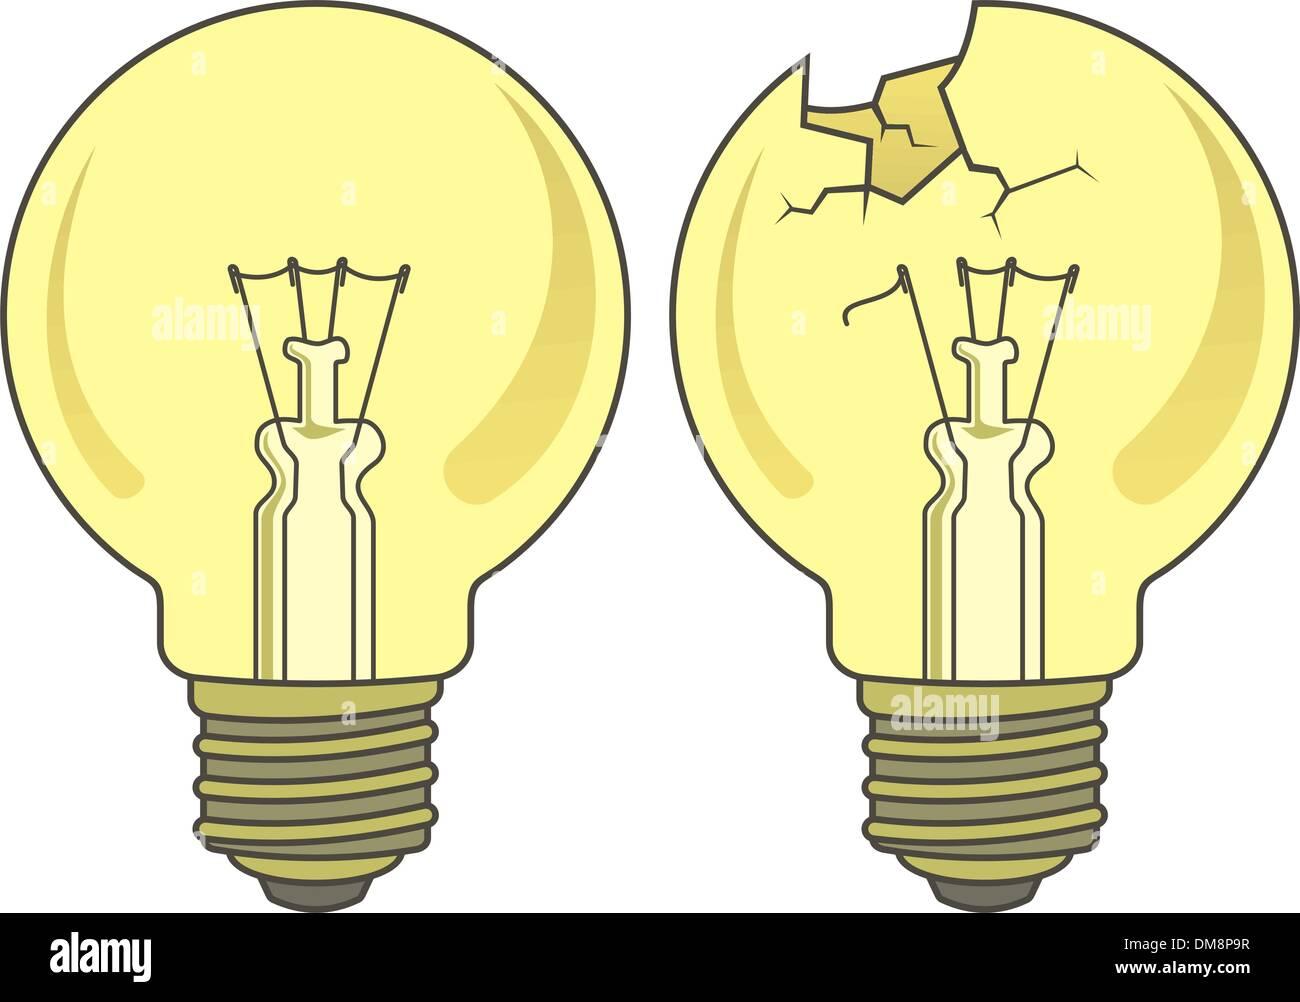 Lamp - Stock Vector